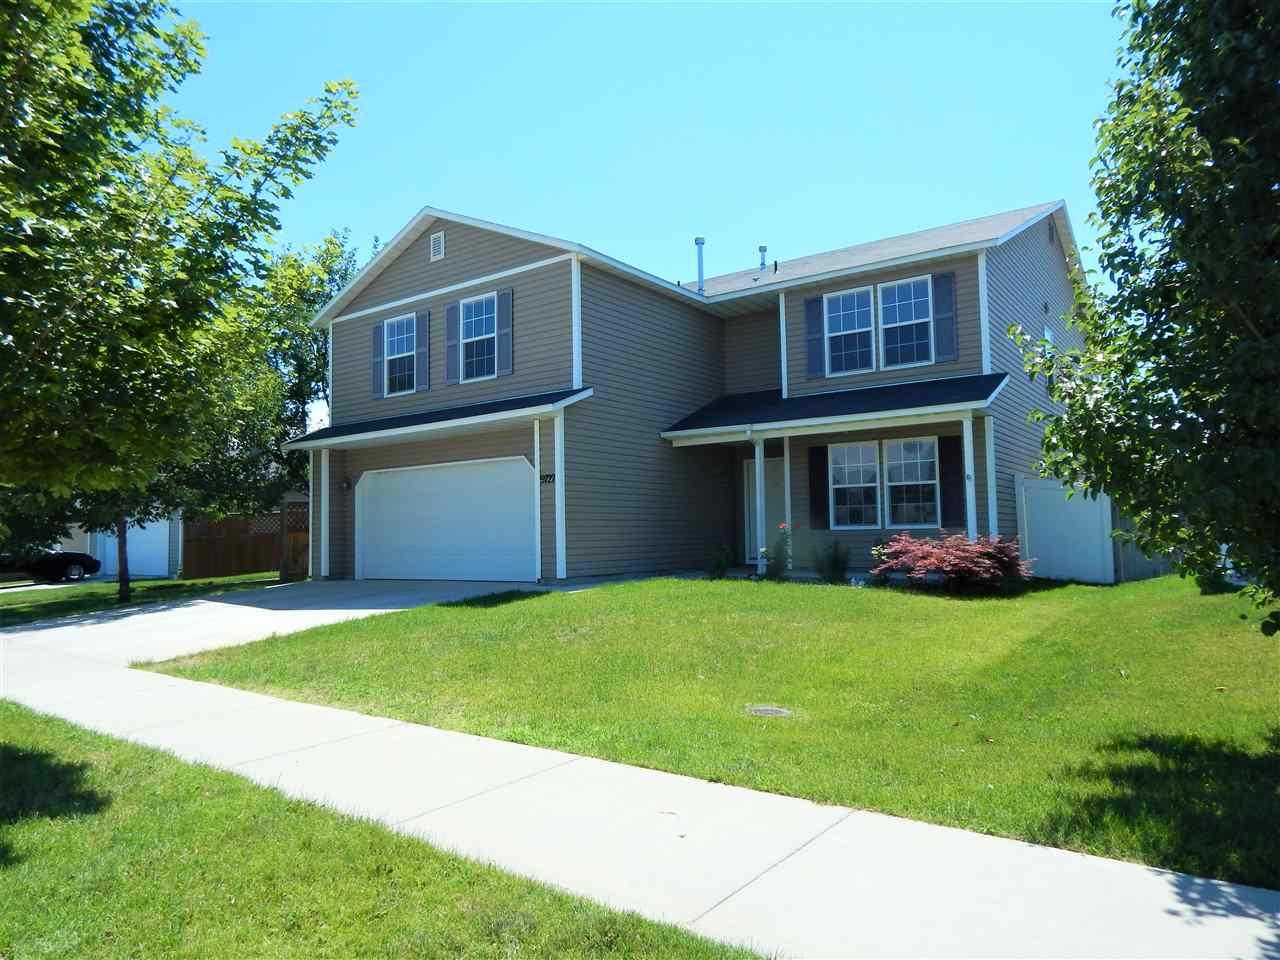 9727 W Bigwood,Boise,Idaho 83709,5 Bedrooms Bedrooms,2.5 BathroomsBathrooms,Residential,9727 W Bigwood,98665270